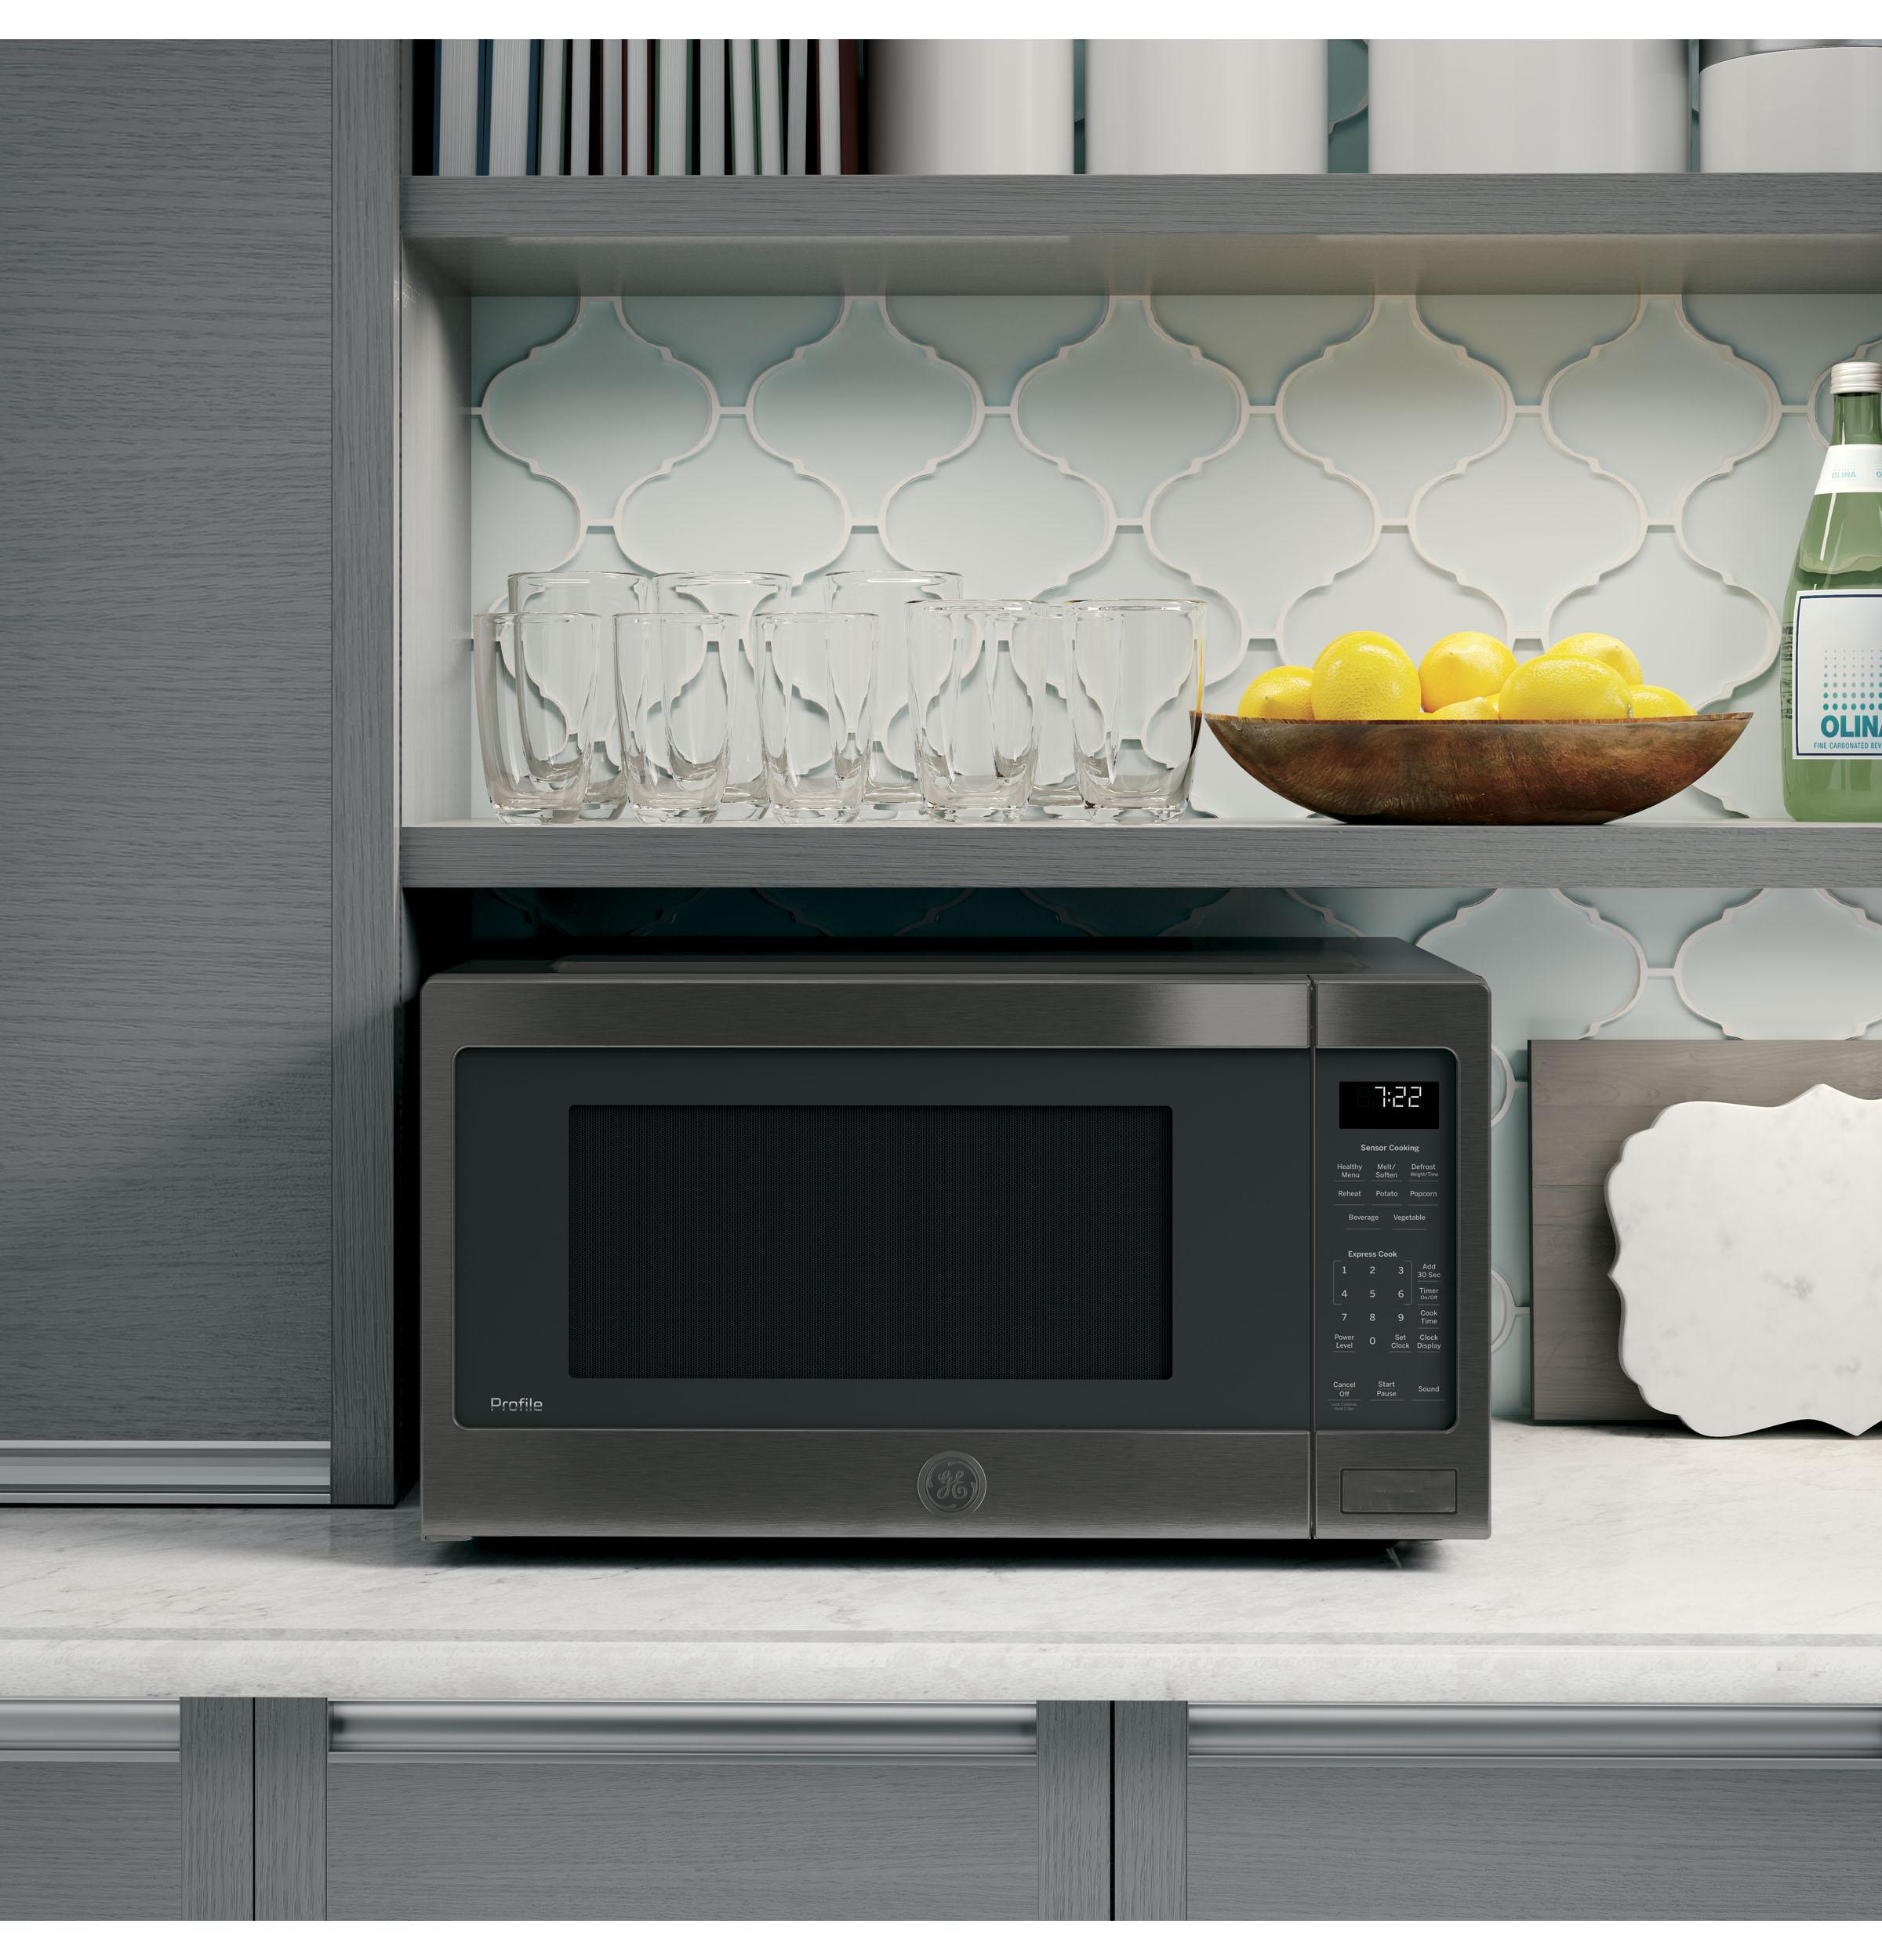 Model: PES7227BLTS | GE Profile GE Profile™ Series 2.2 Cu. Ft. Countertop Sensor Microwave Oven